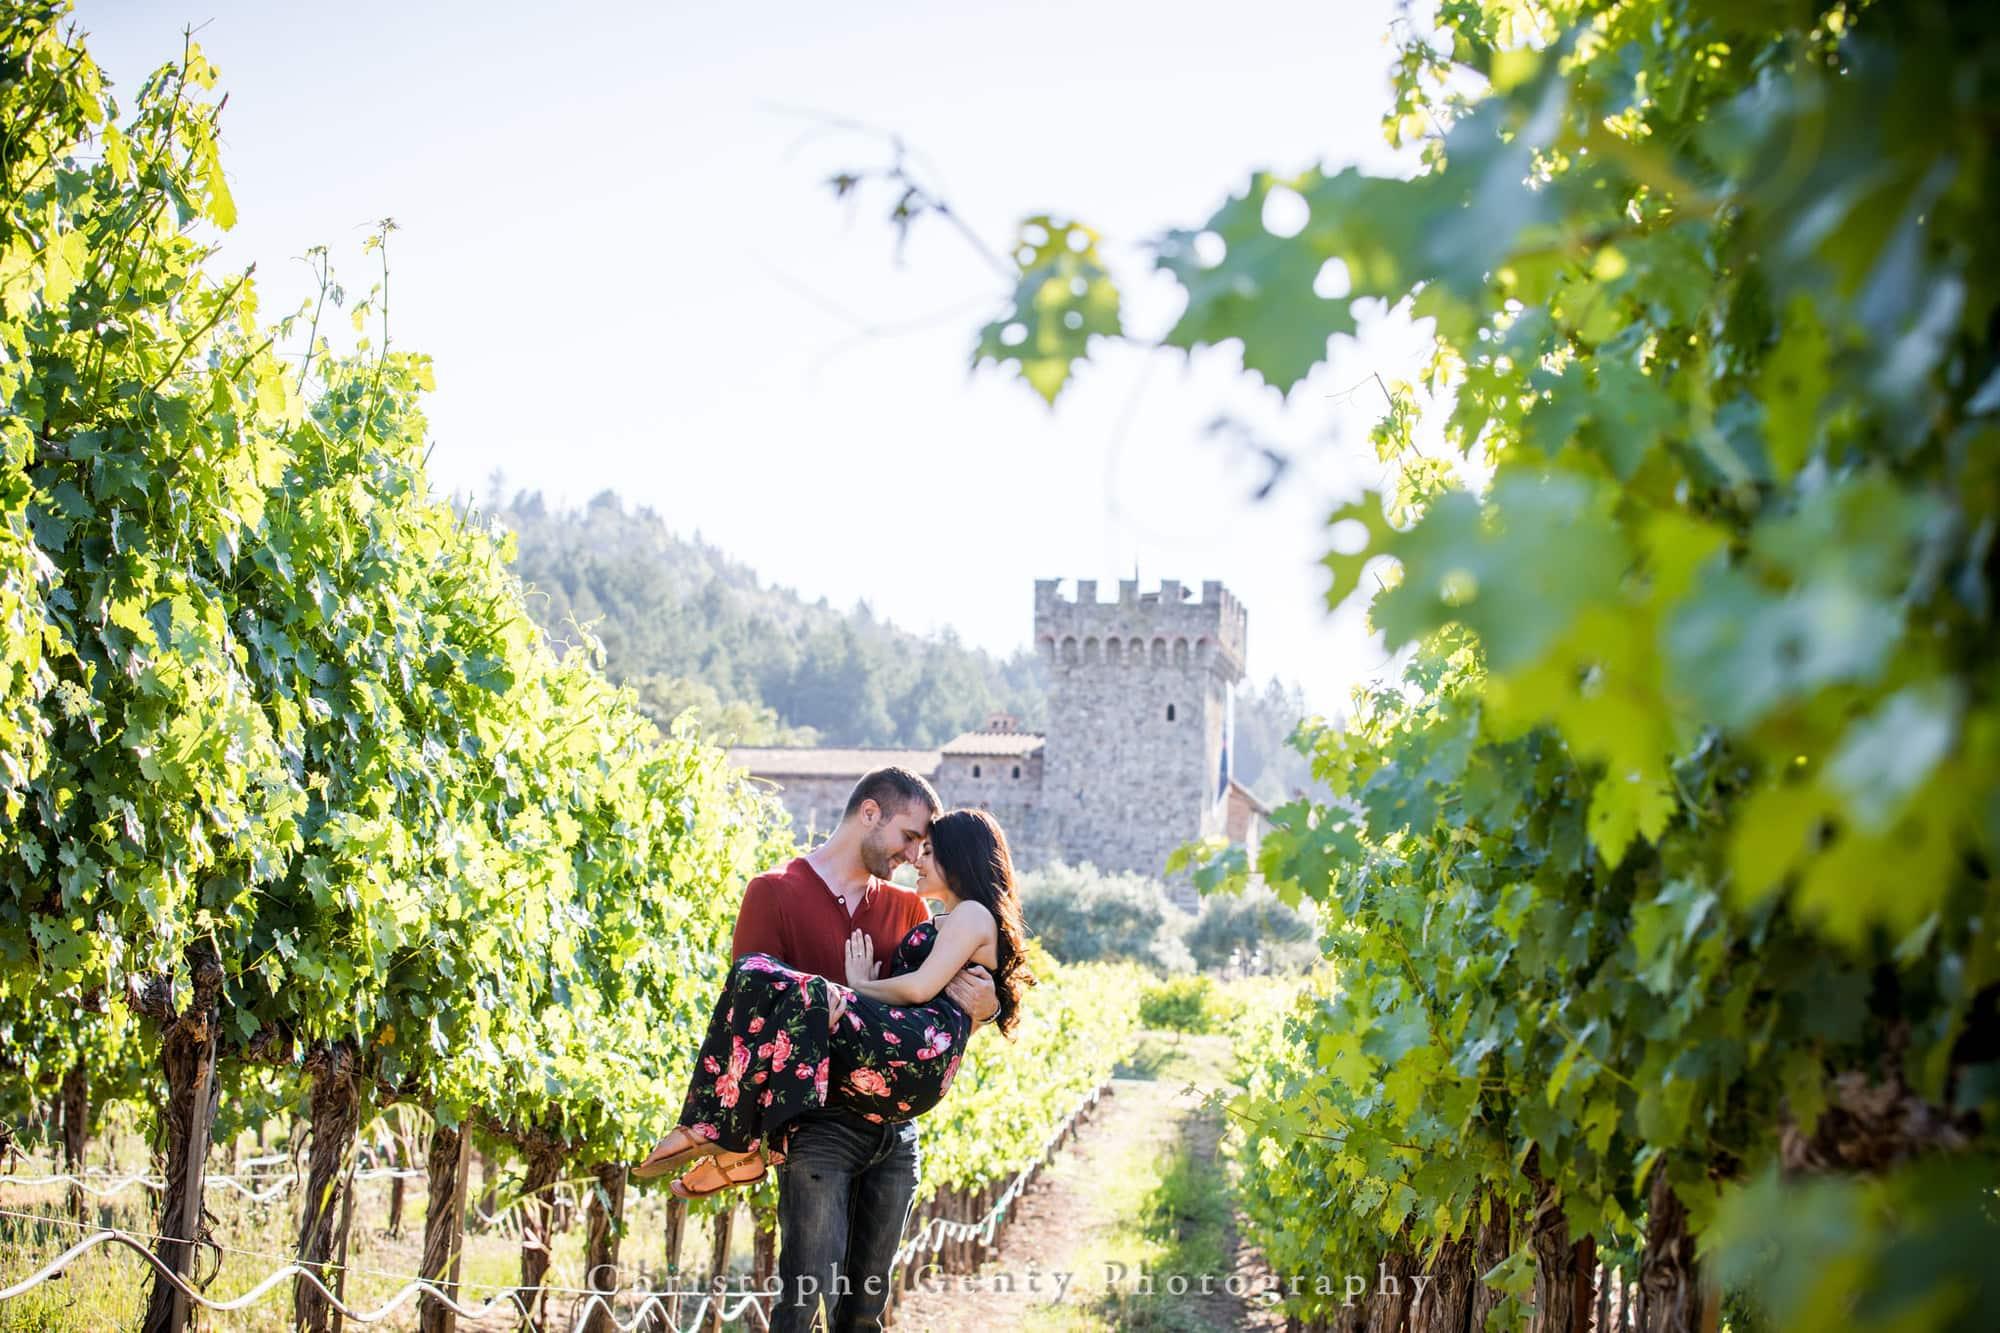 Castello di Amorosa Marriage Proposal Photography 324